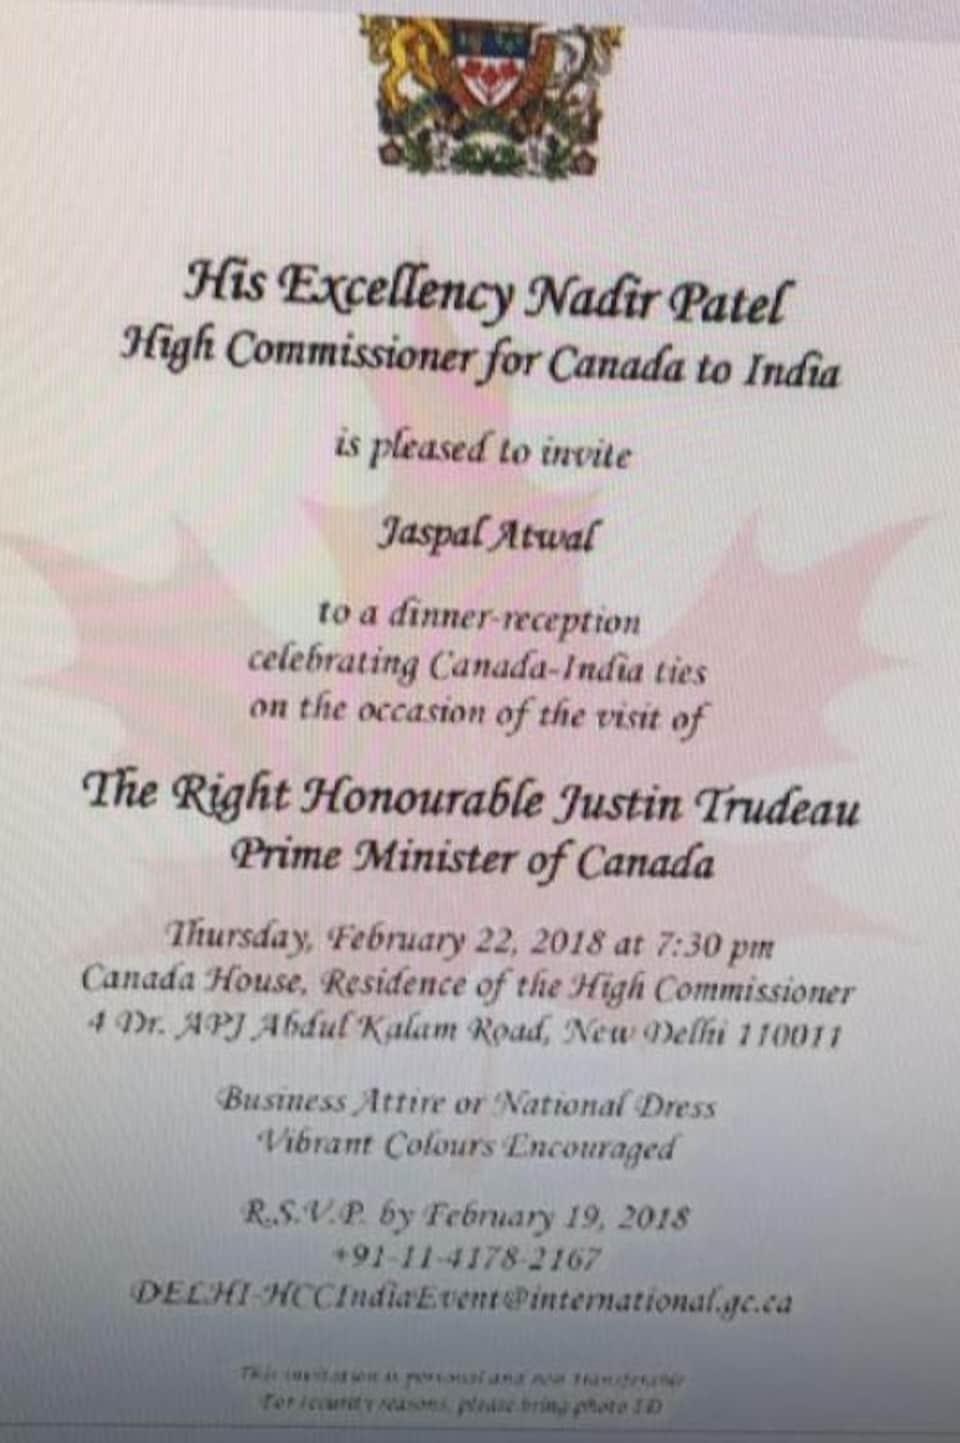 Photo du carton d'invitation transmis à Jaspal Atwal.